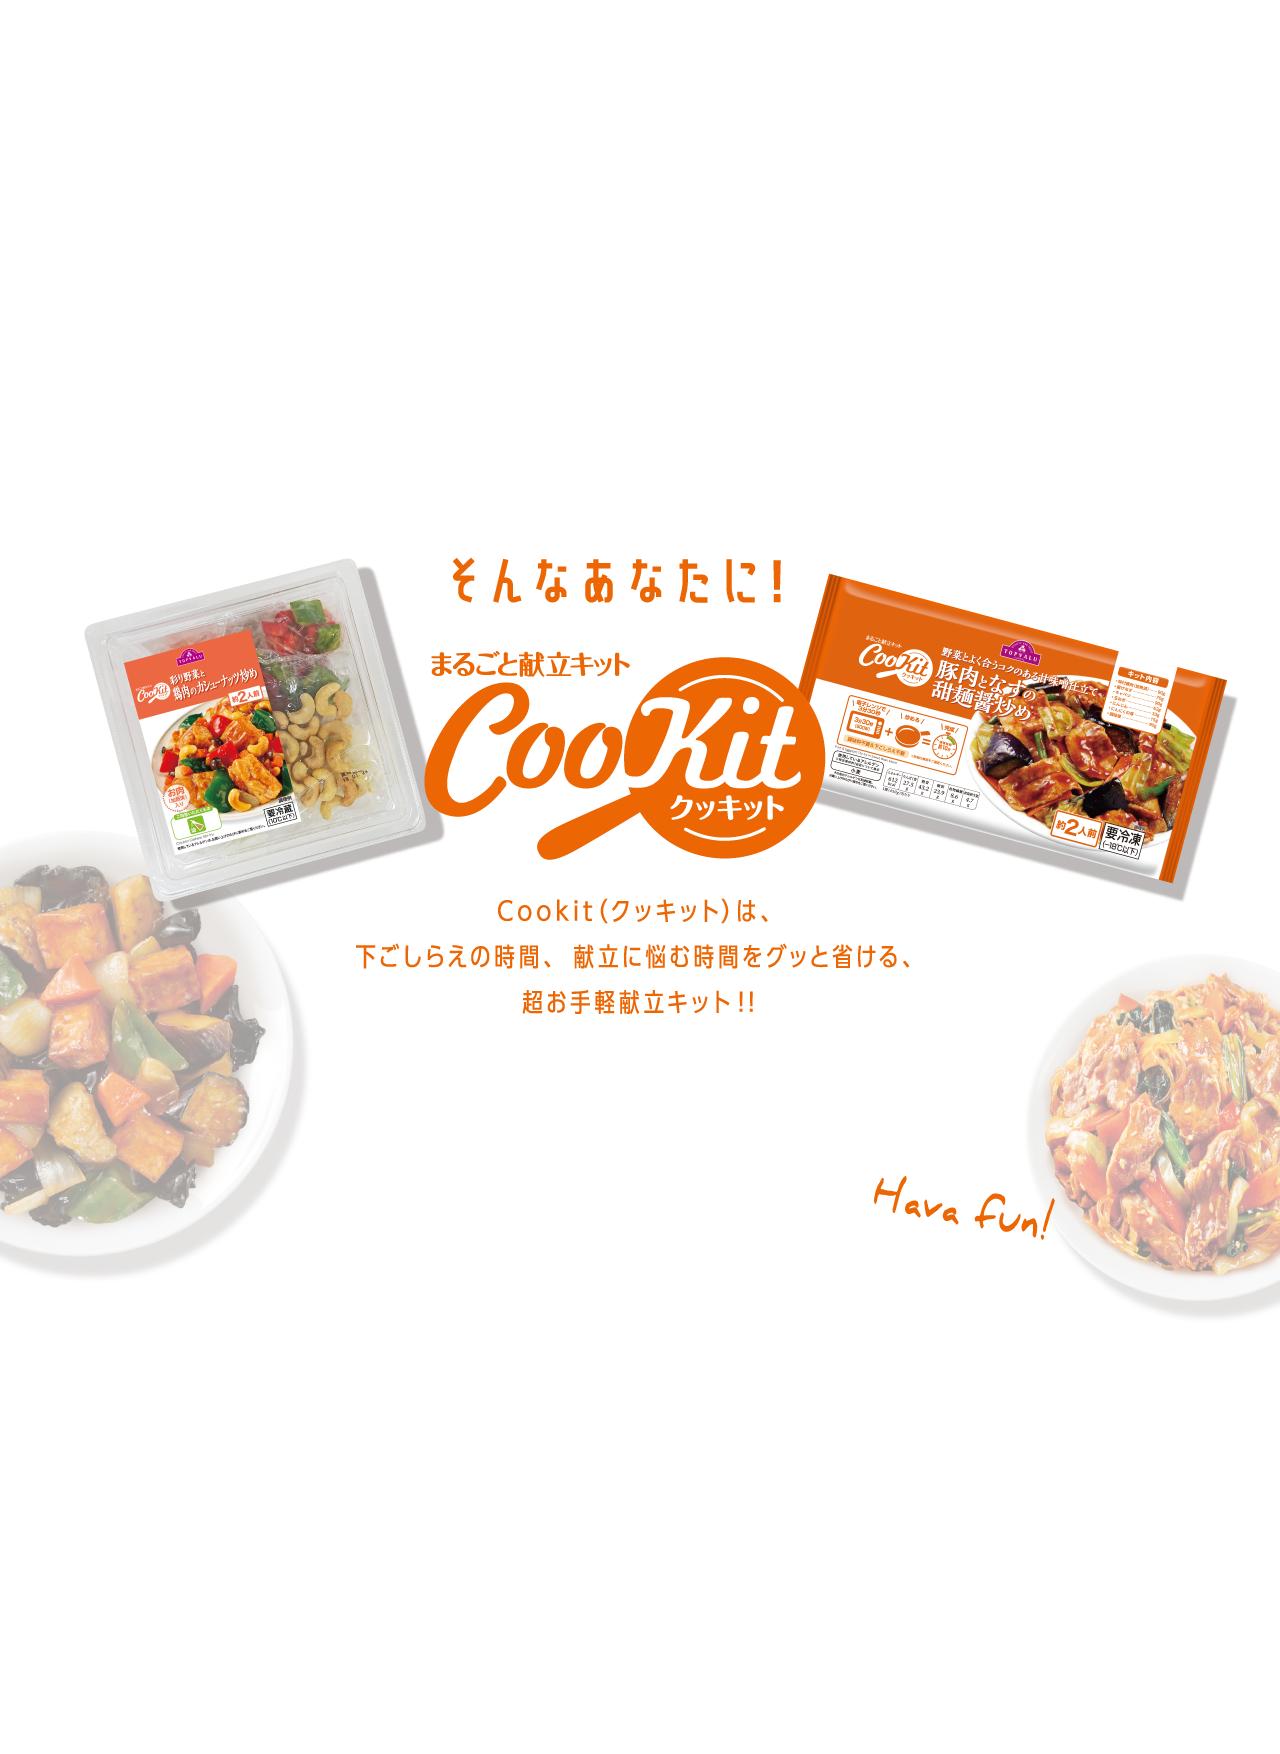 Cookit(クッキット)は、下ごしらえの時間、献立に悩む時間をグッと省ける、超お手軽献立キット!!